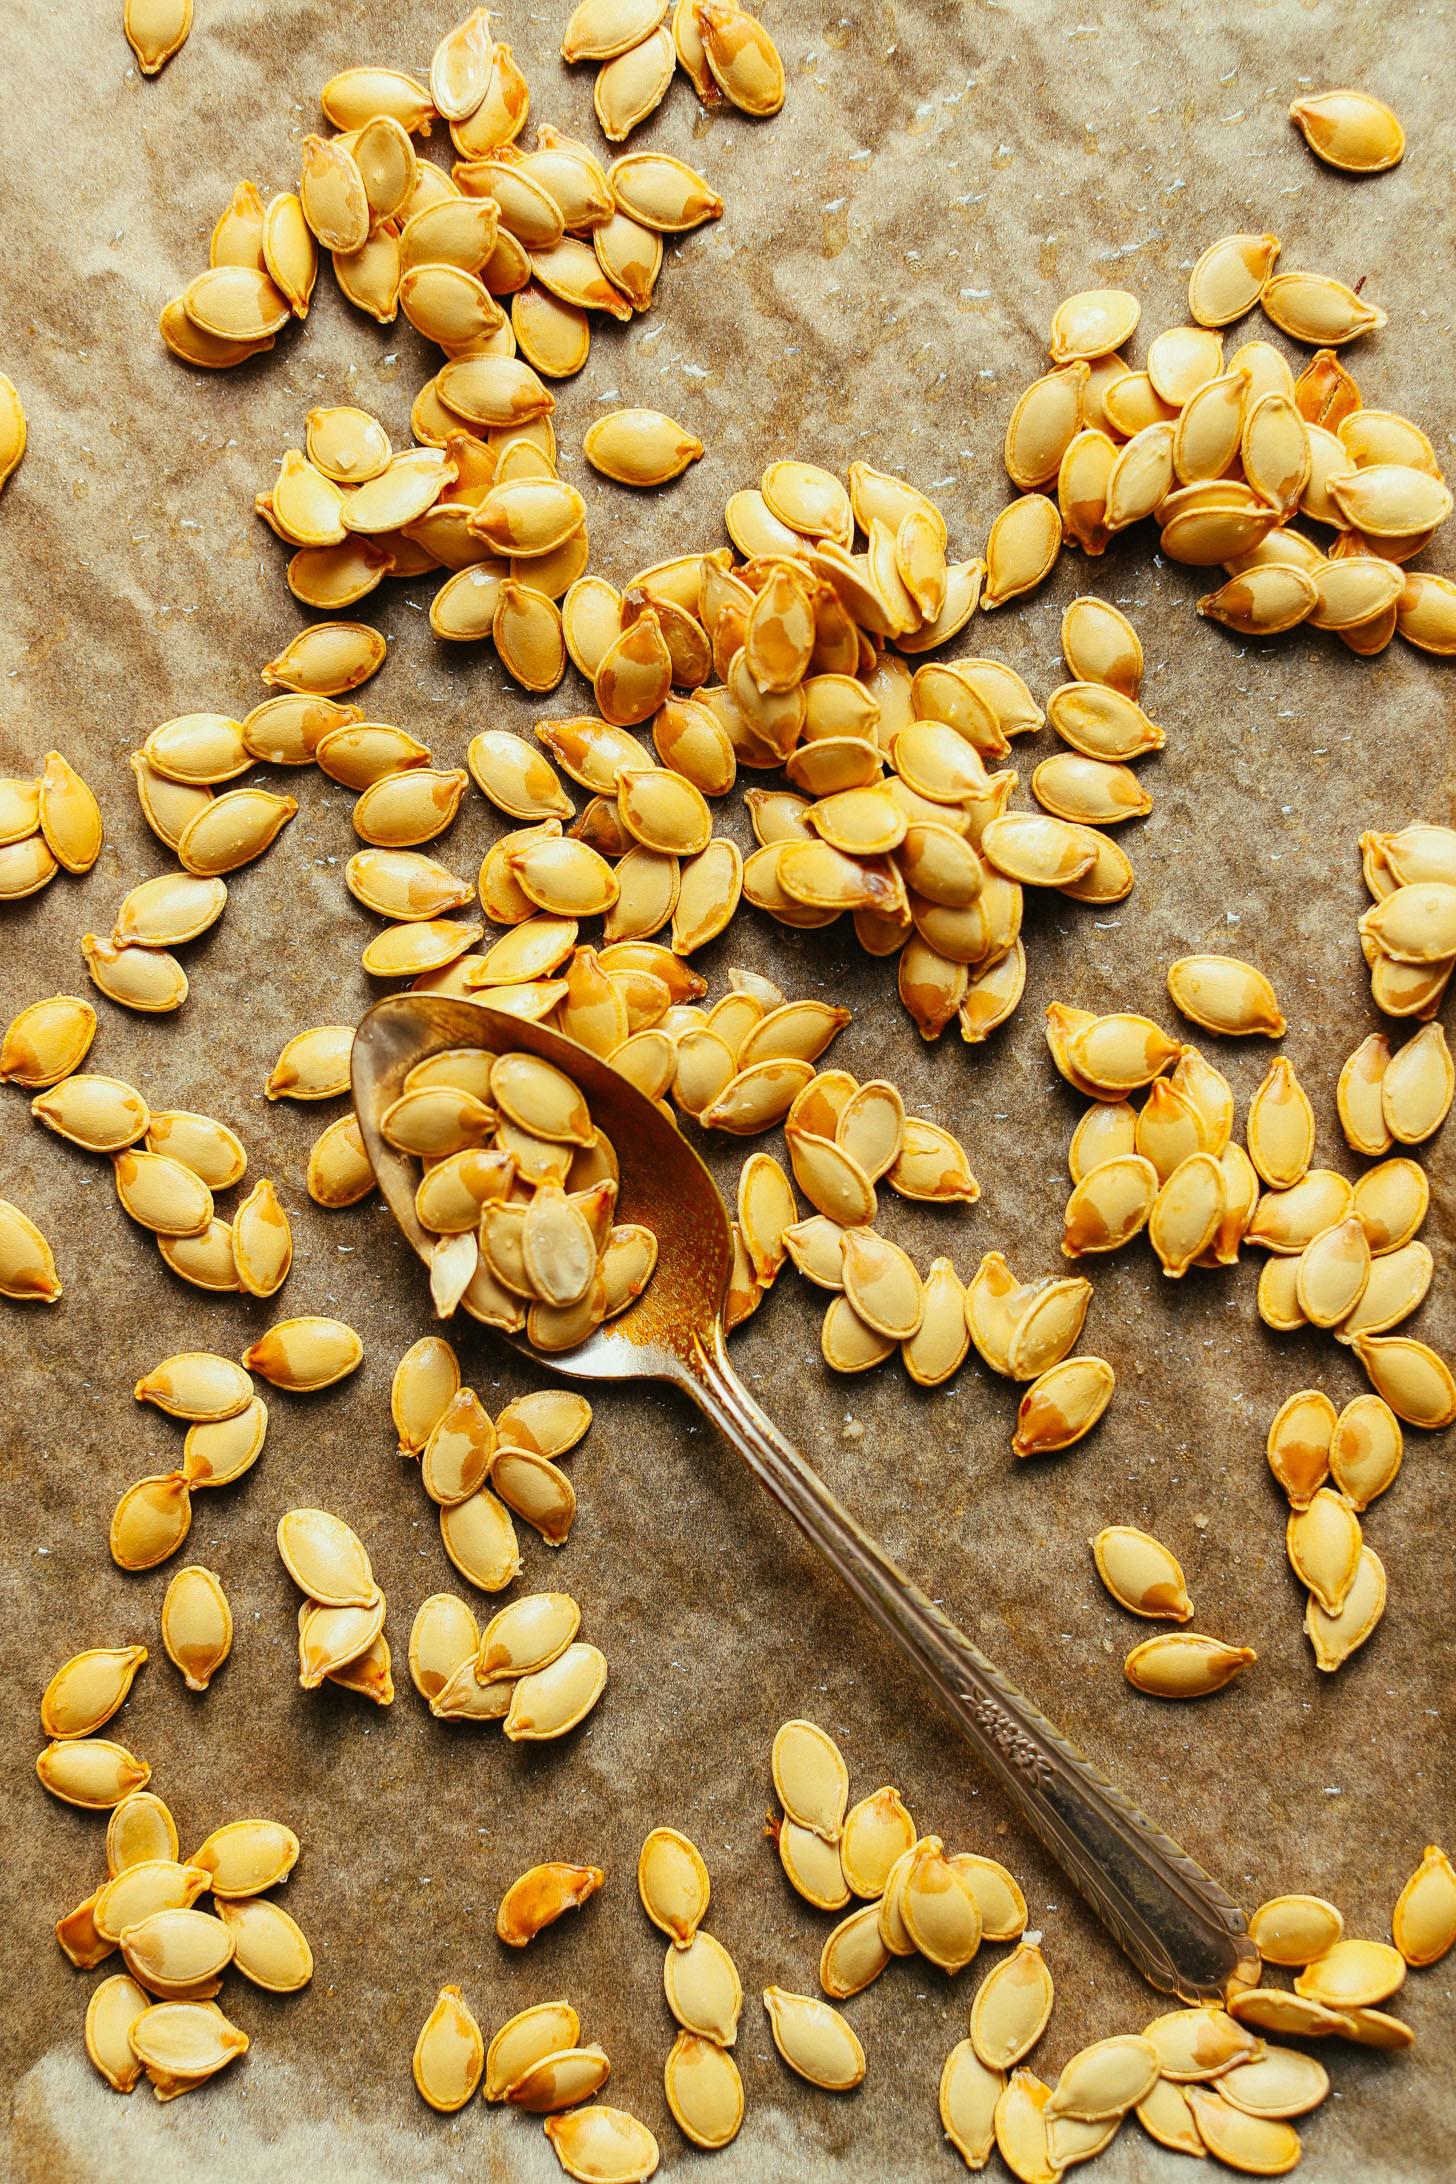 Healthy Pumpkin Seed Recipes  How to Roast Pumpkin Seeds